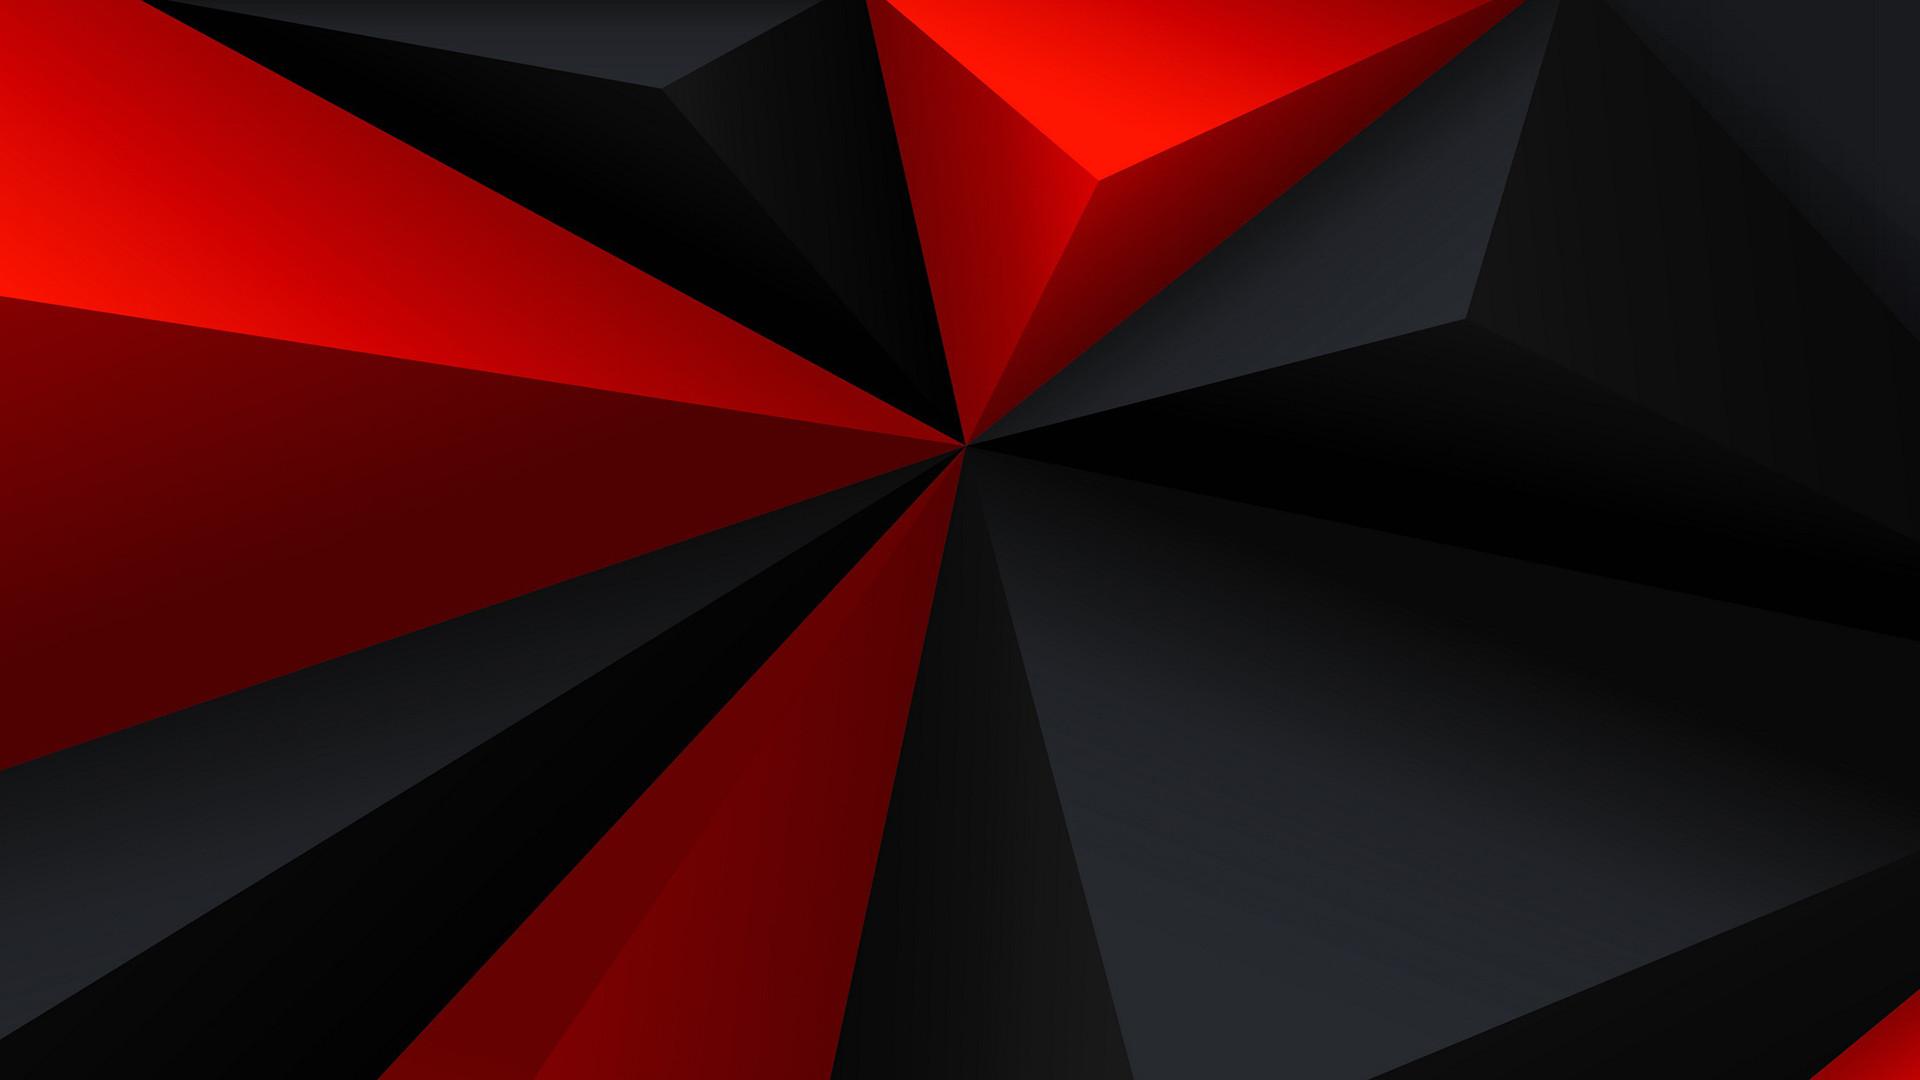 Red Black Wallpaper